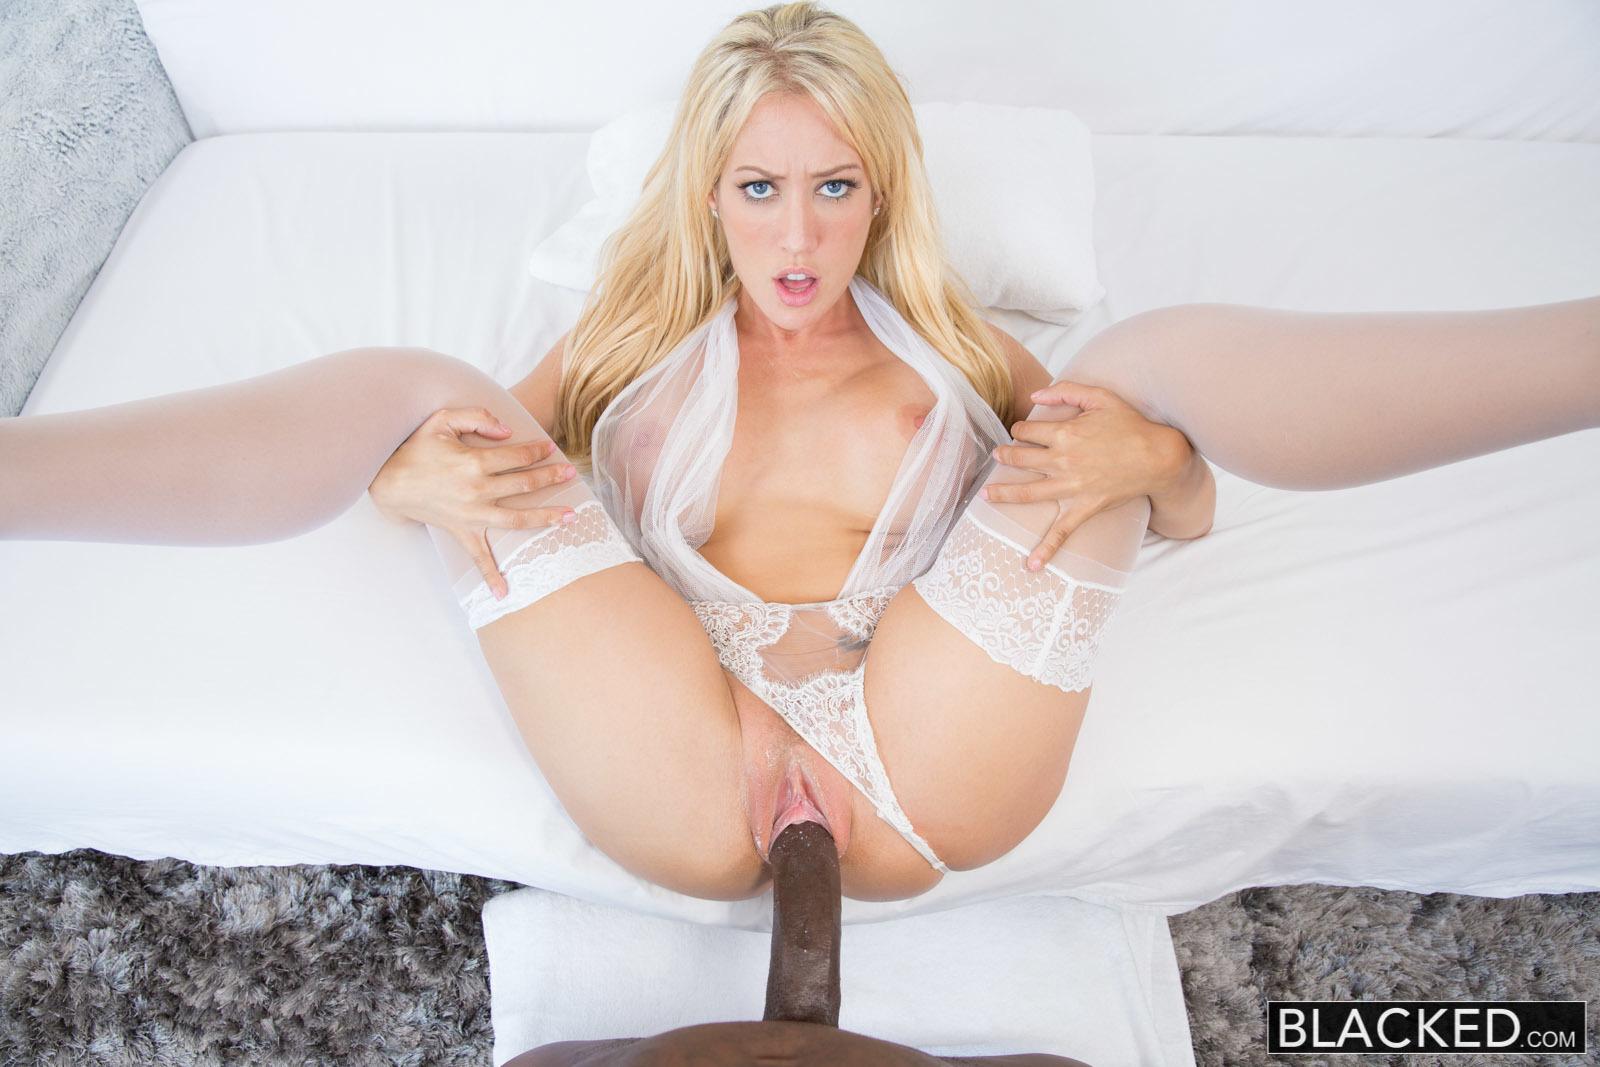 Spanish mom daughter porn